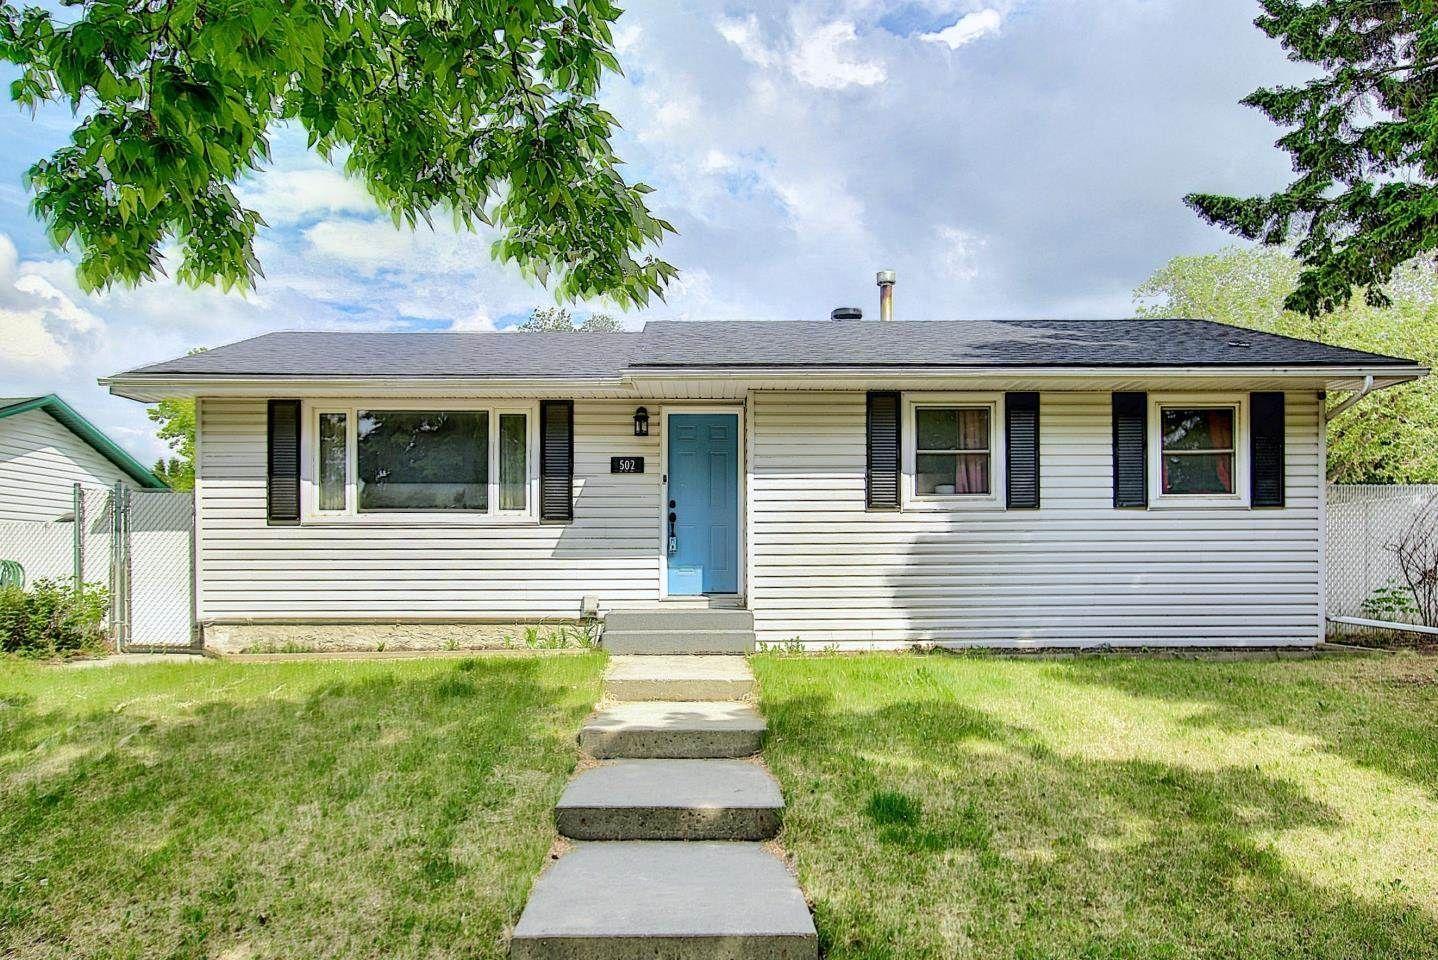 Main Photo: 502 KING Street: Spruce Grove House for sale : MLS®# E4248650